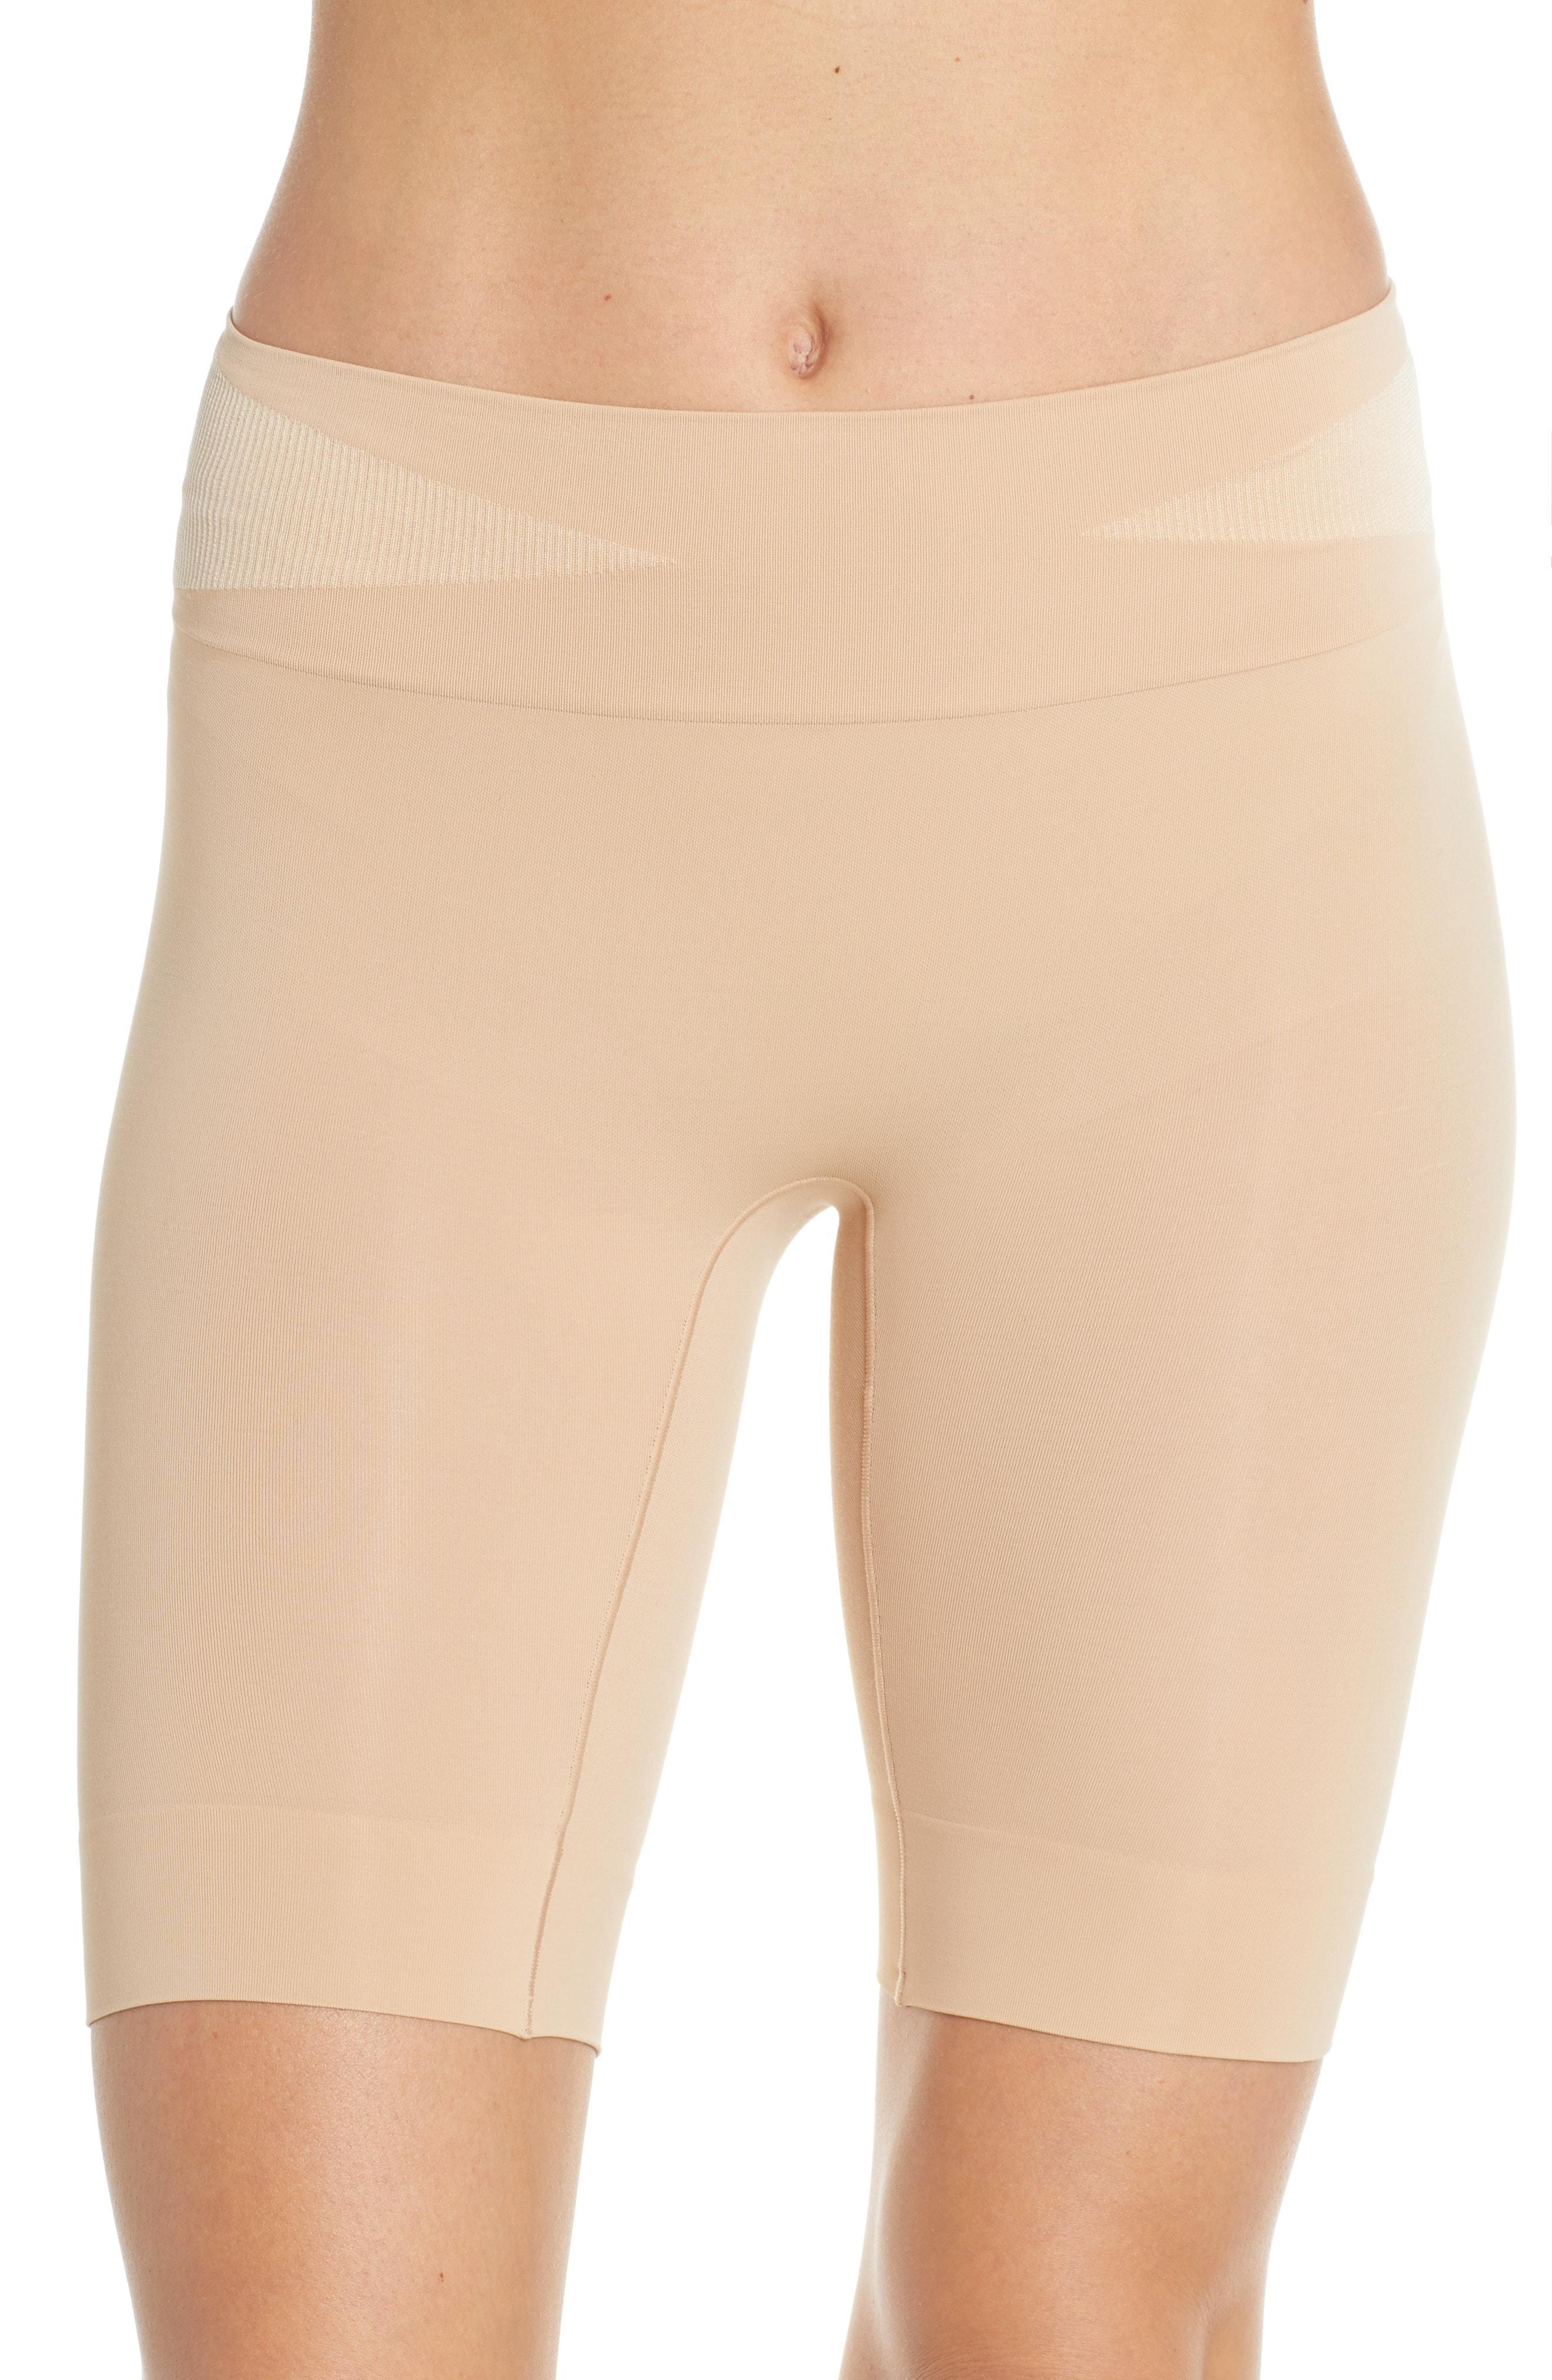 ef76d0fdf58 Lyst - Jockey Skimmies Cooling Slip Shorts in Natural